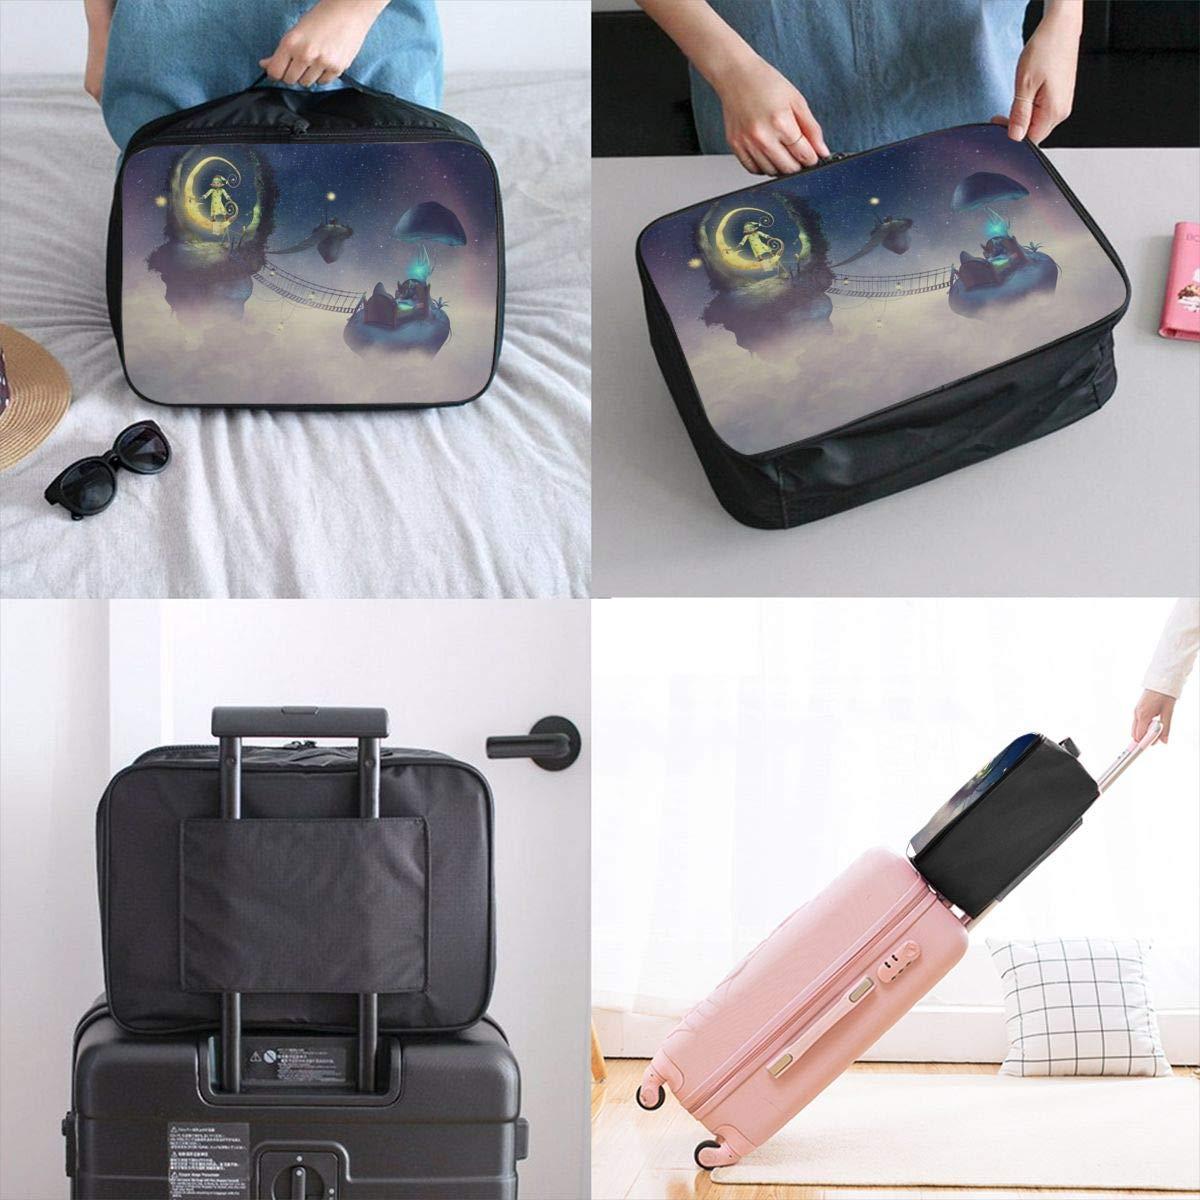 Sky Moonlight Mysterious Mushroom Bed Travel Lightweight Waterproof Foldable Storage Carry Luggage Large Capacity Portable Luggage Bag Duffel Bag